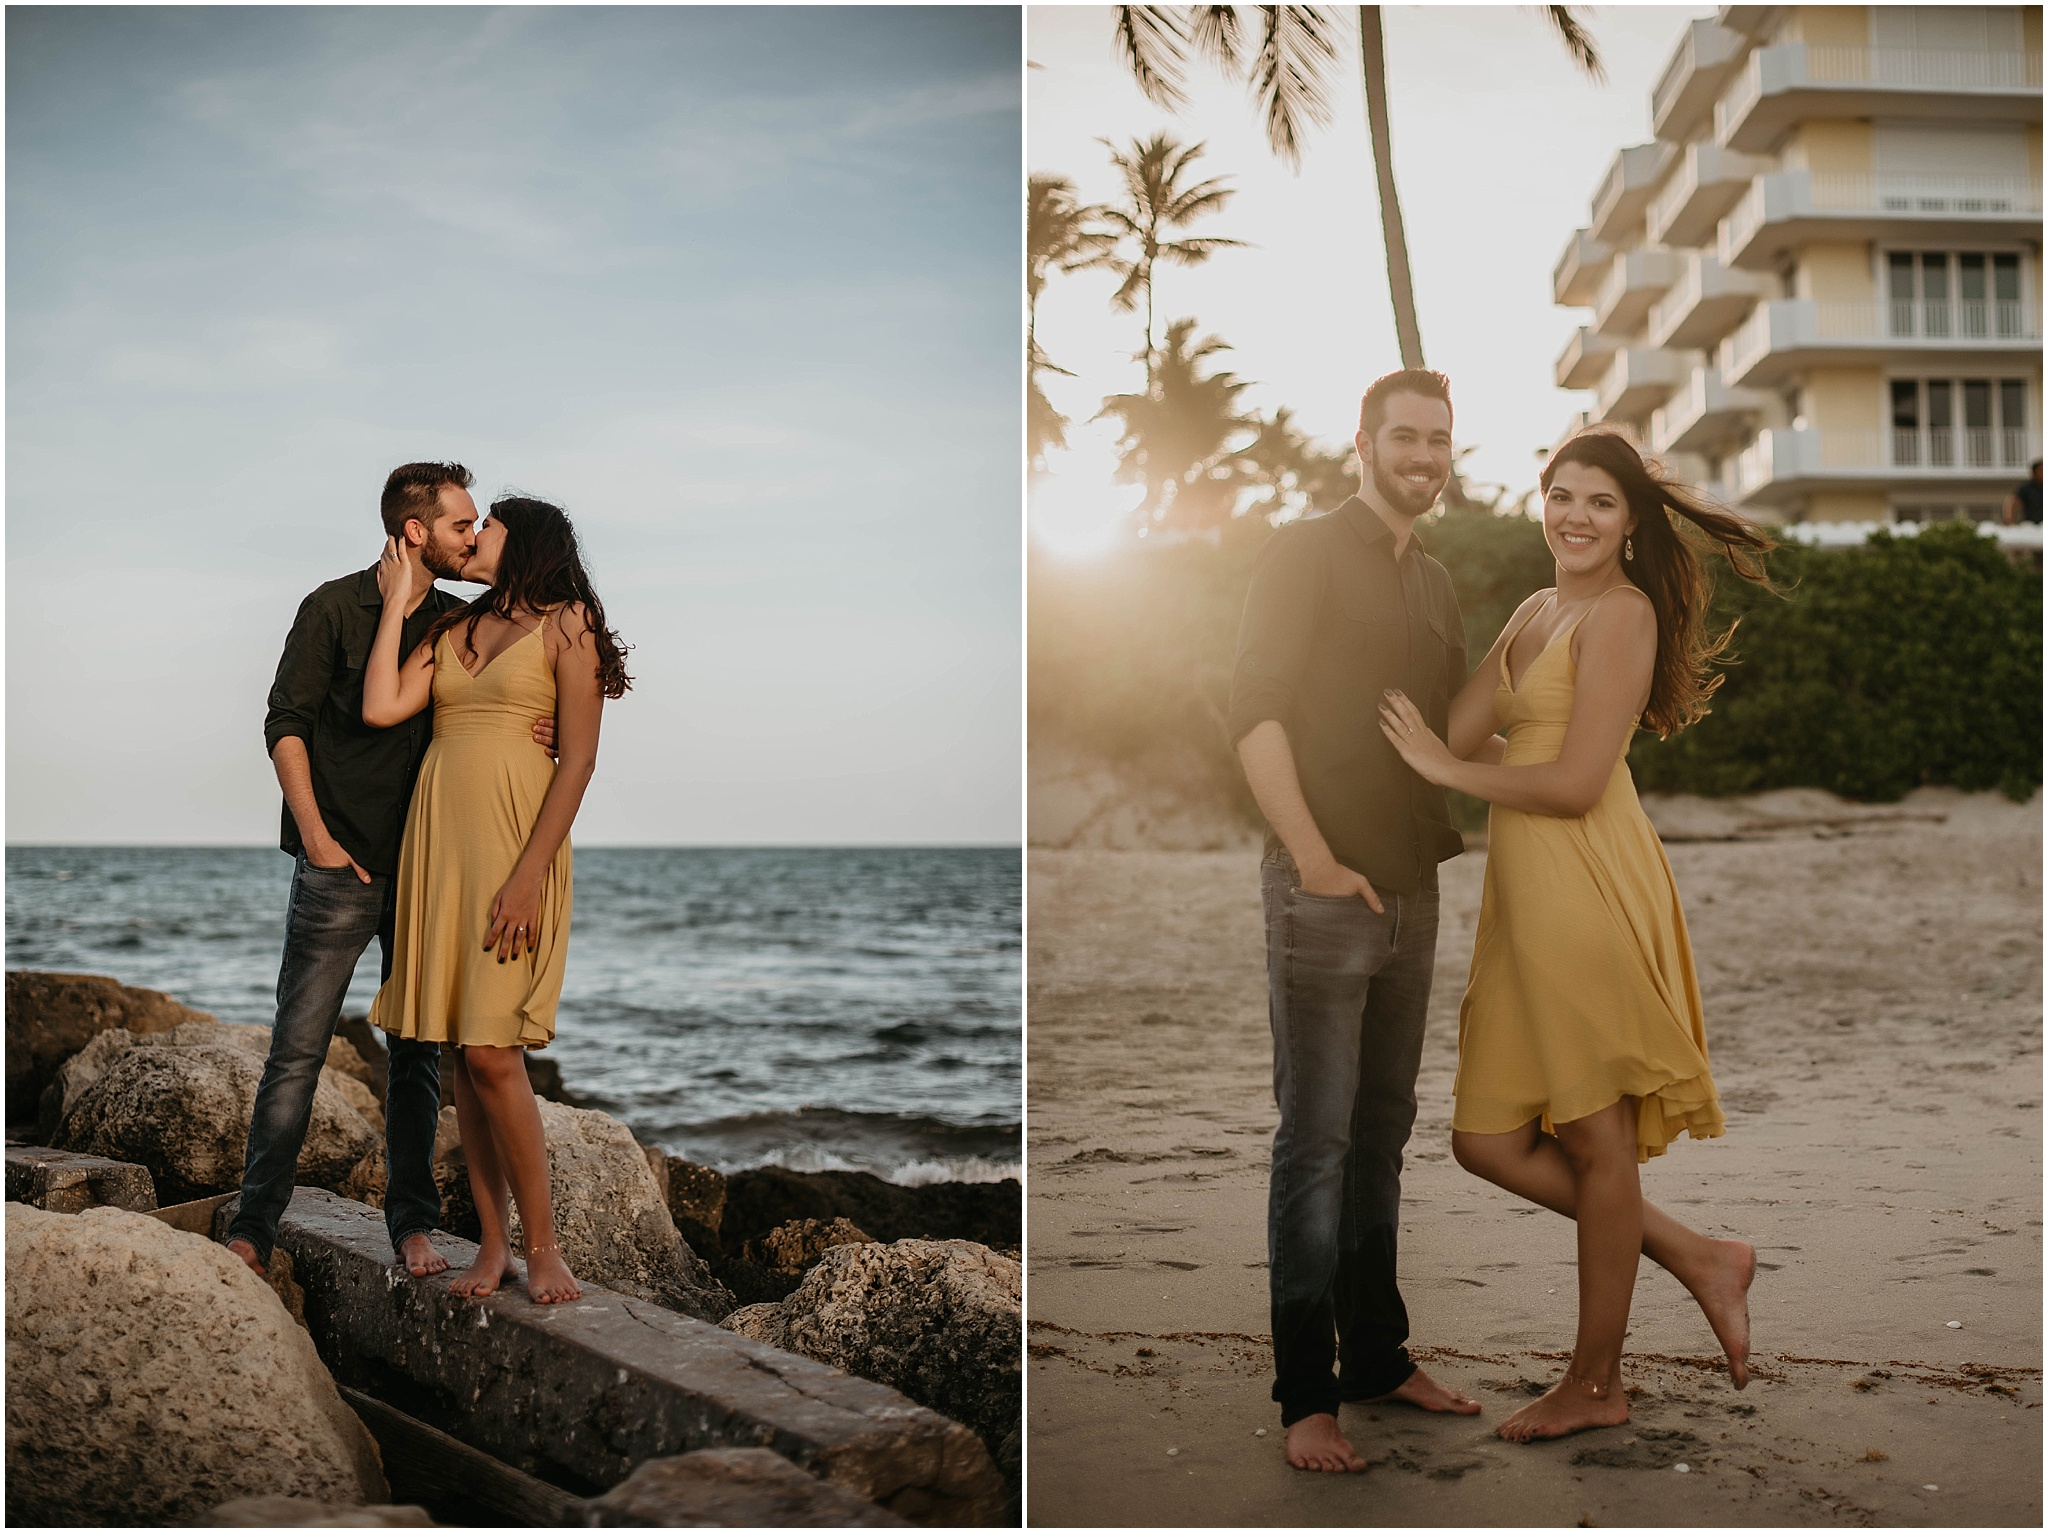 Worth-Avenue-Palm-Beach-engagement-photographer_0013.jpg